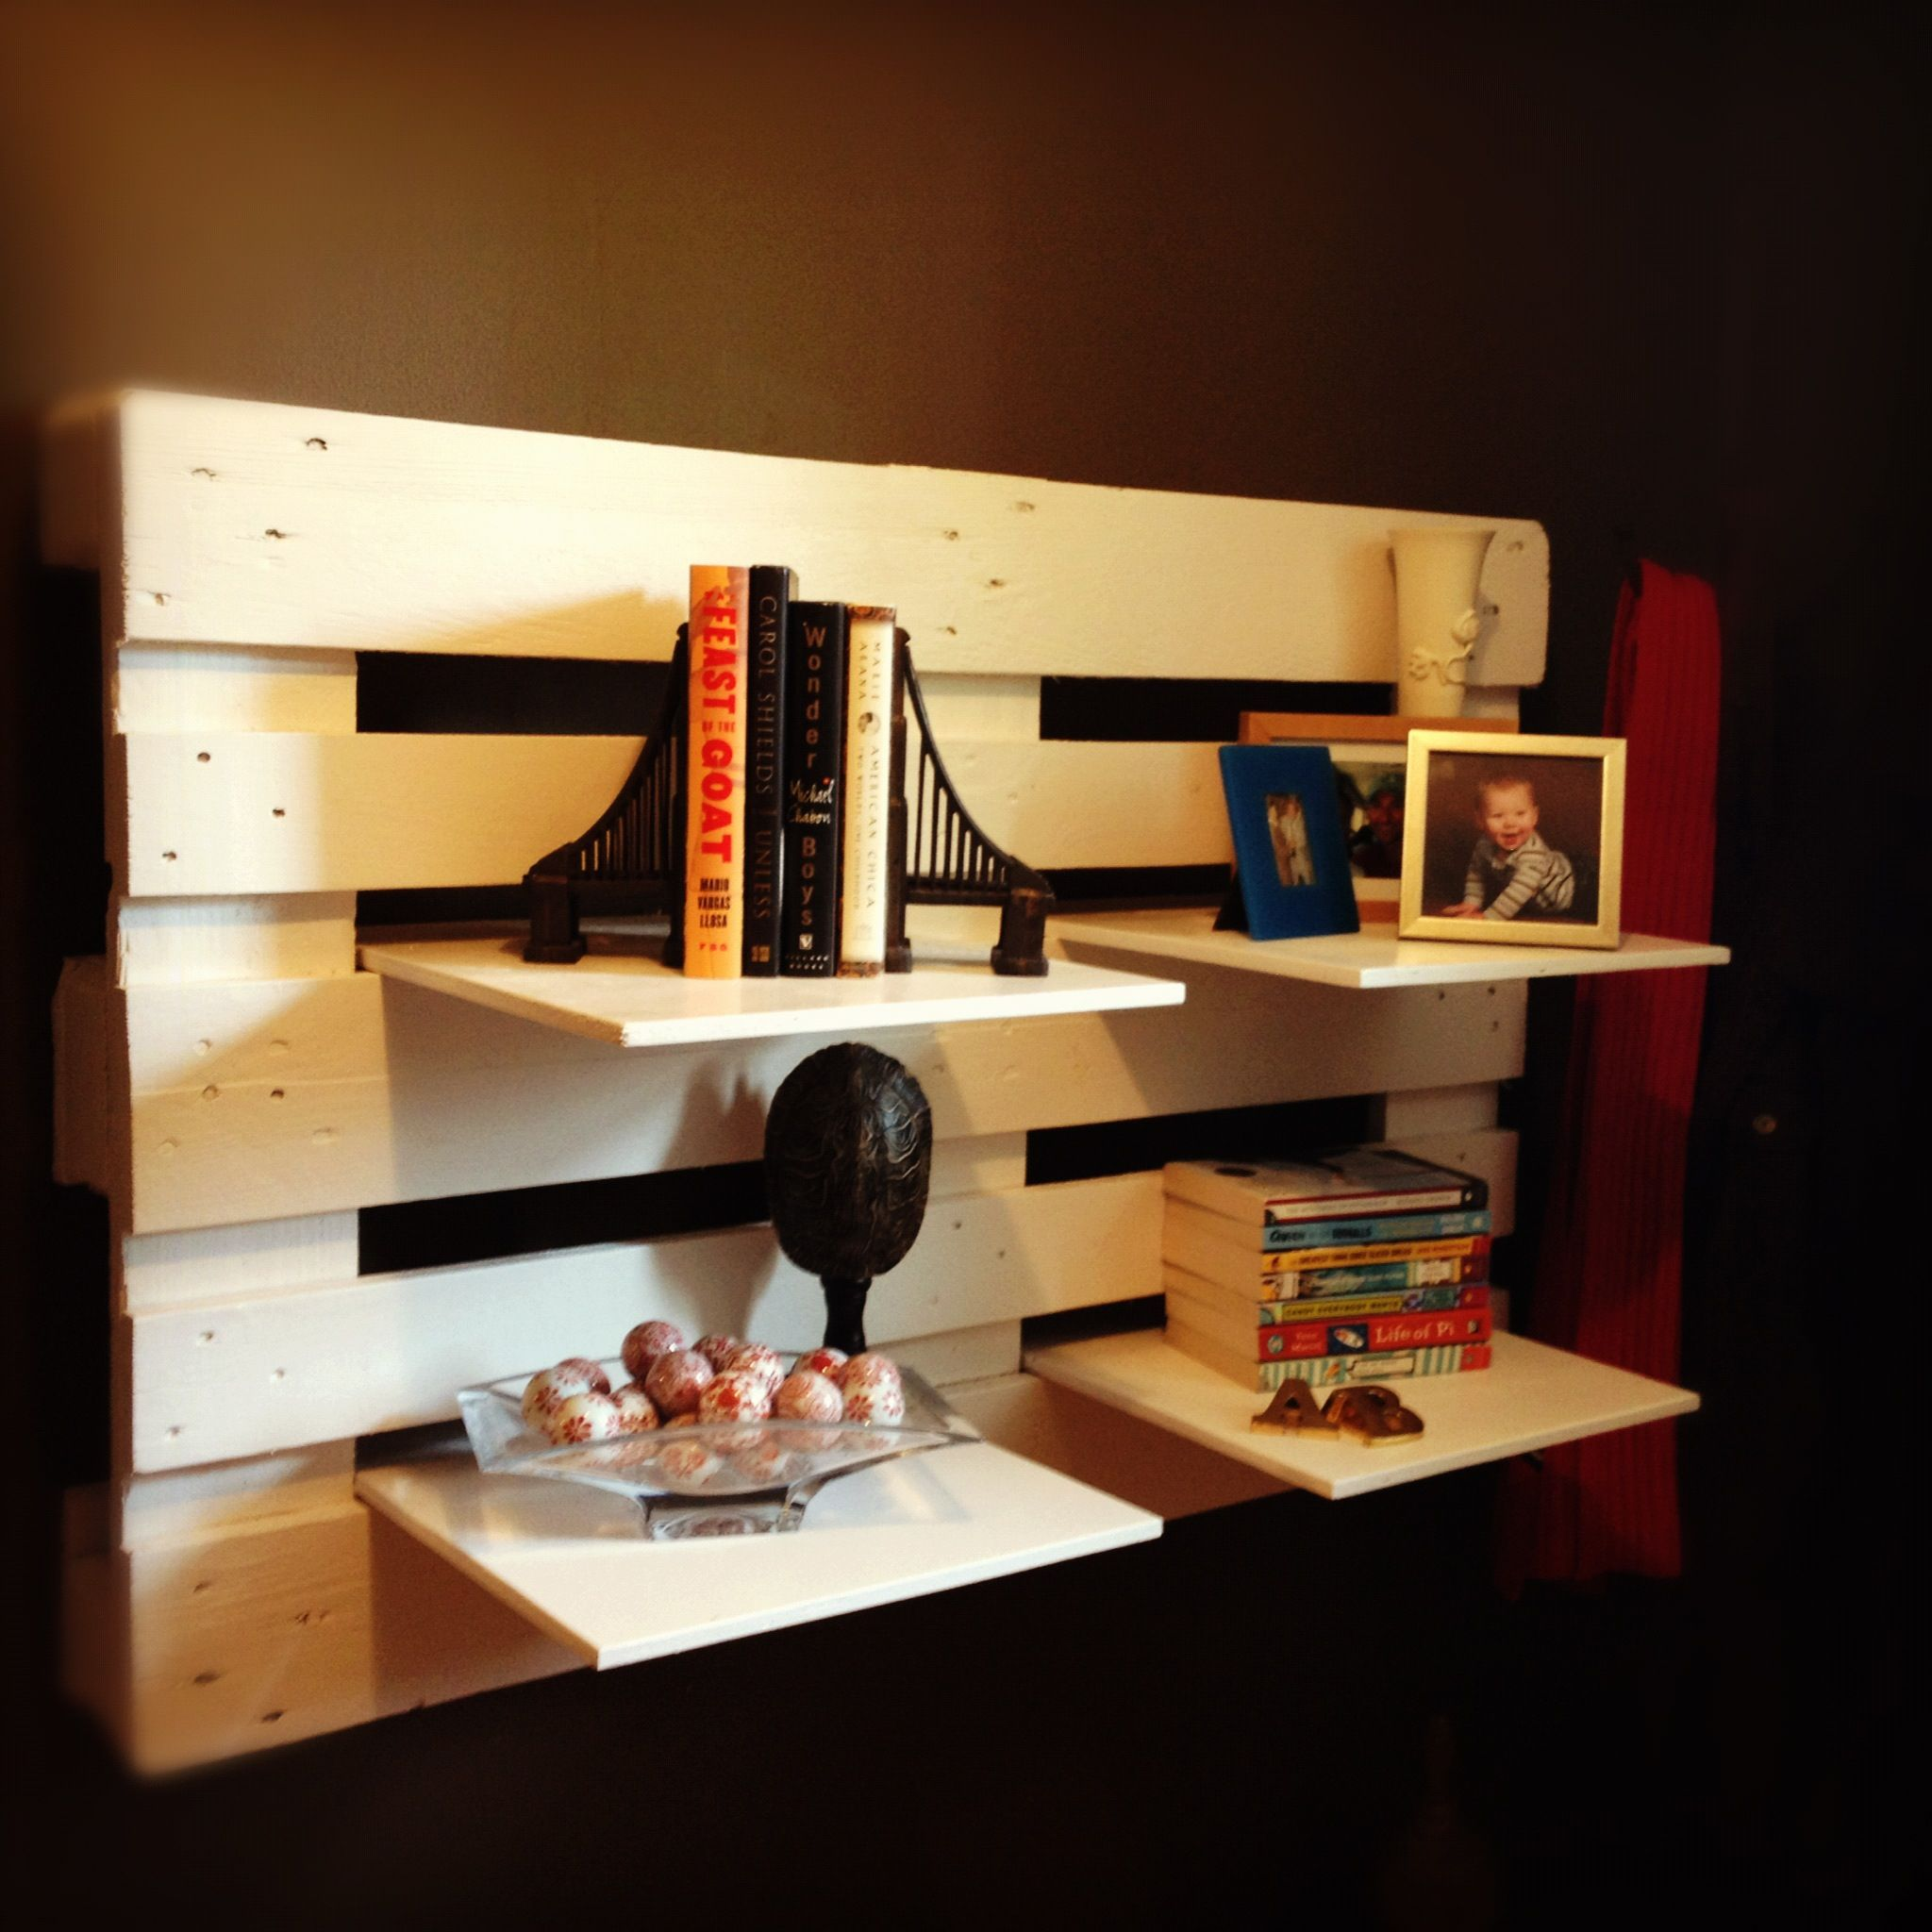 Creative Diy Bookshelves Design Ideas With Floating Shelves Shelf Display Shelving Storage Wooden Dividers Wall Room Ladder Adjule Building Rack